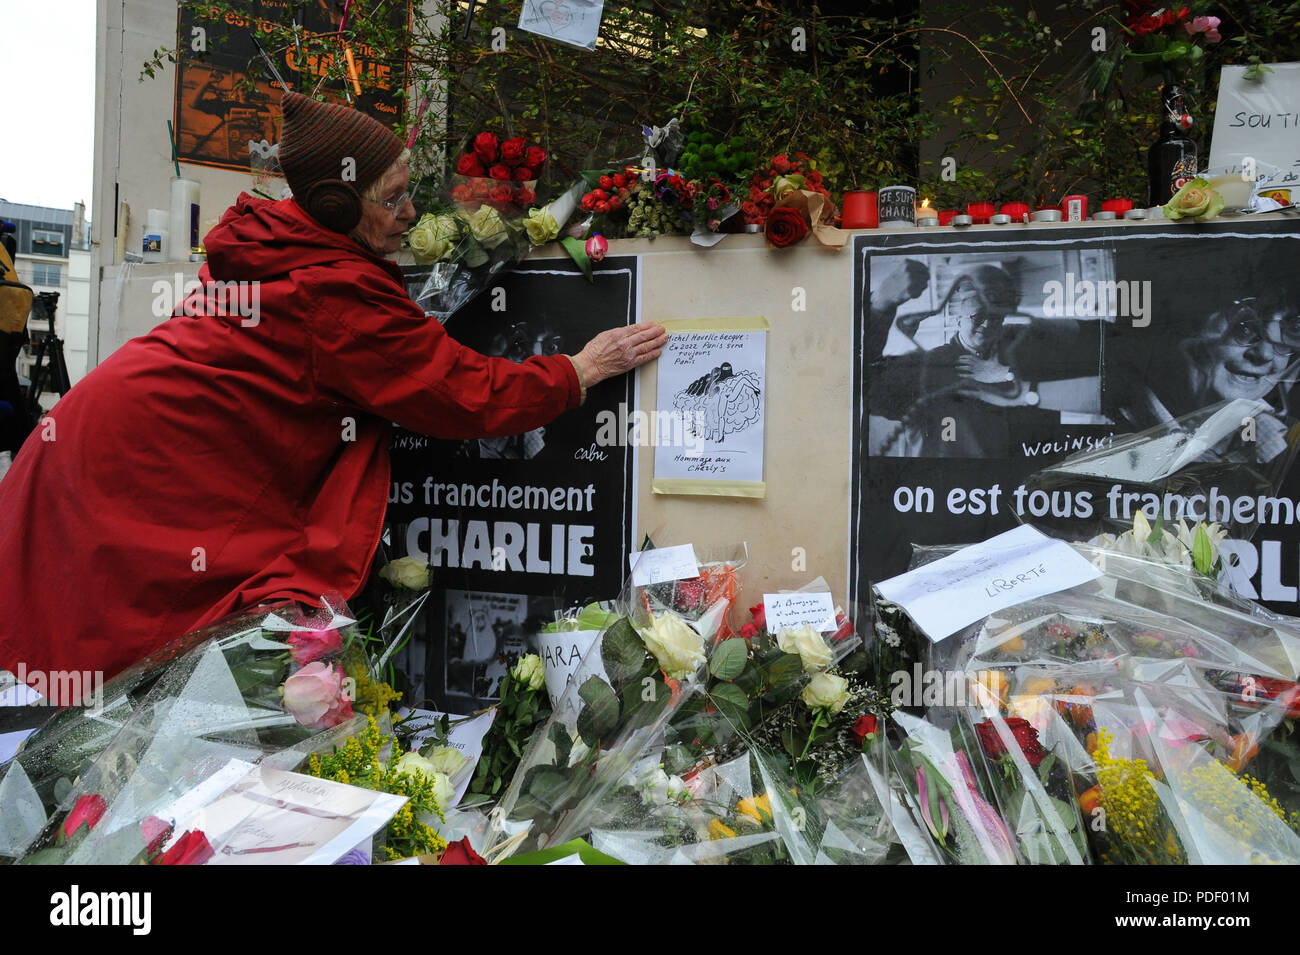 January 8, 2015 - Paris, France: People pay tribute to Charlie Hebdo staff near the satirical magazine headquarter.  Des gens se recueillent pres d'un memorial improvise au lendemain de l'attaque meurtriere contre Charlie Hebdo. *** FRANCE OUT / NO SALES TO FRENCH MEDIA *** Stock Photo